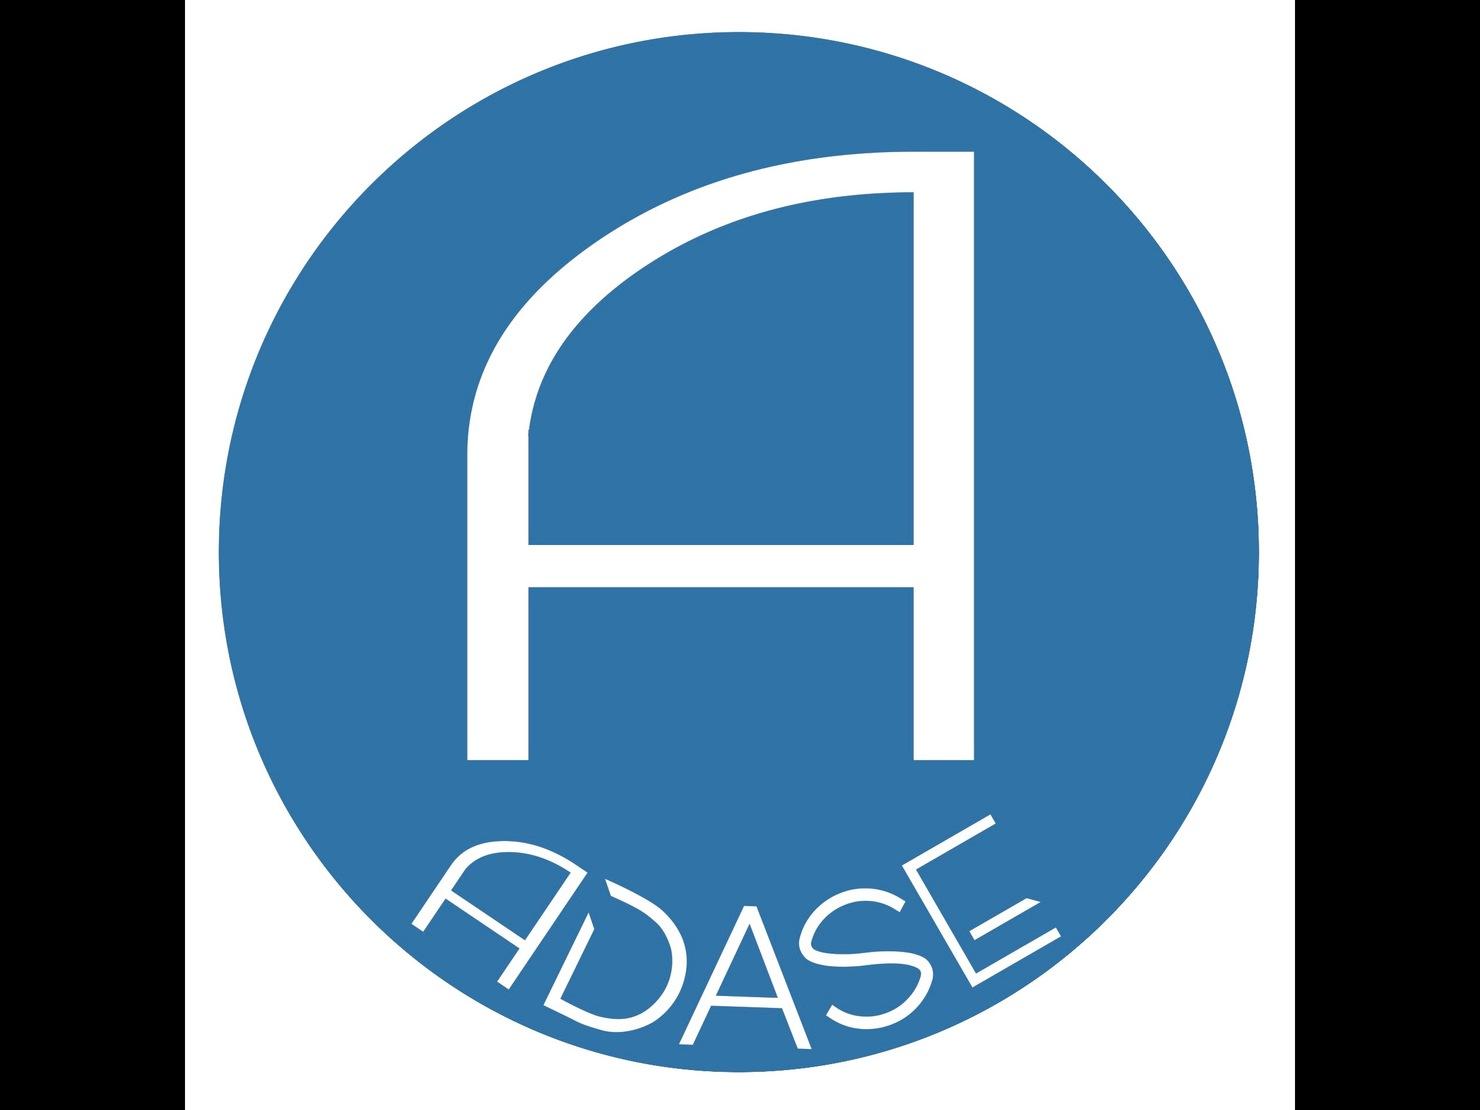 ADASE-0